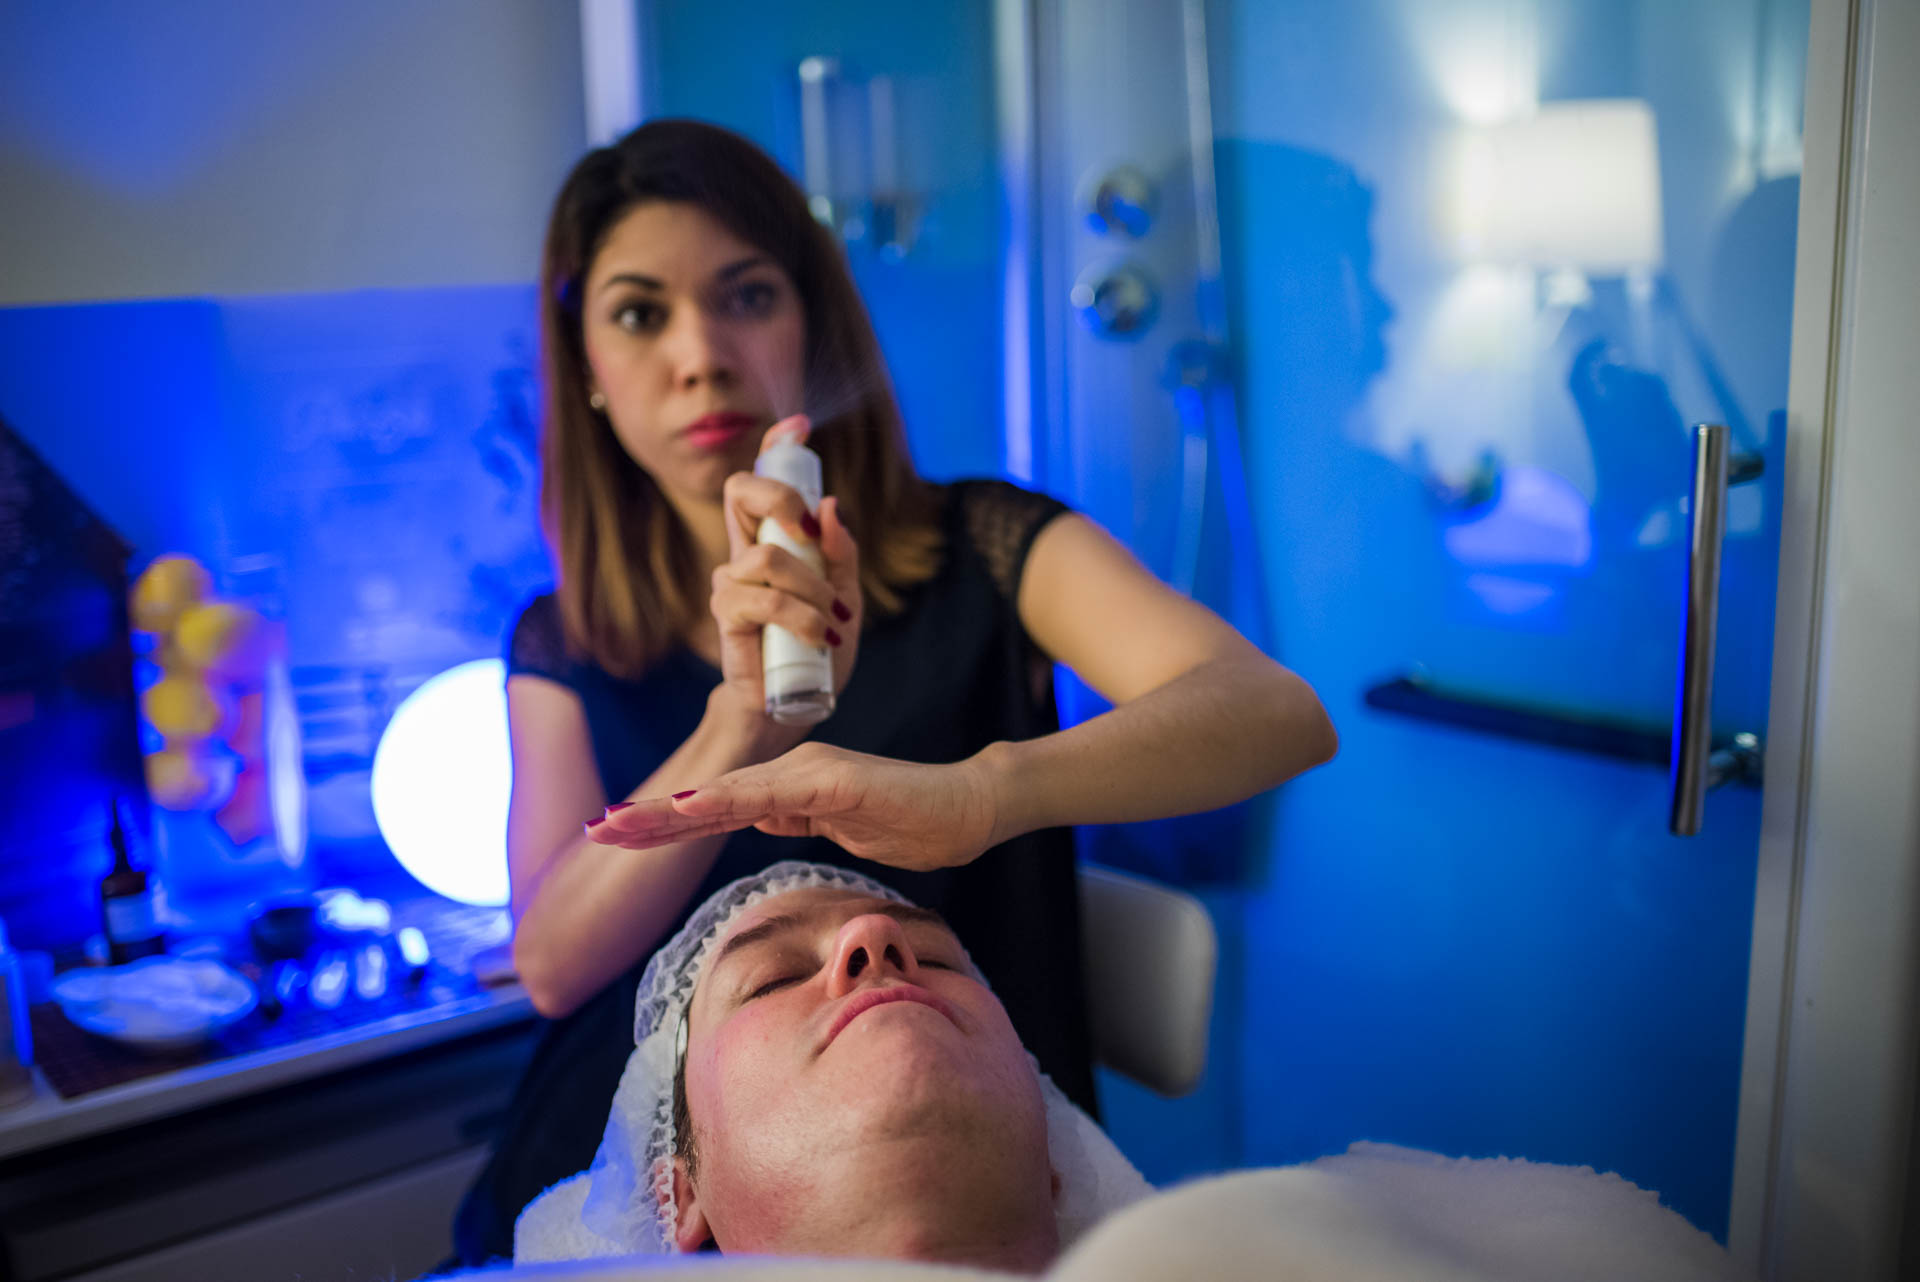 Bioterapia facial belleza masculina Purificacion Varas Madrid a tu estilo